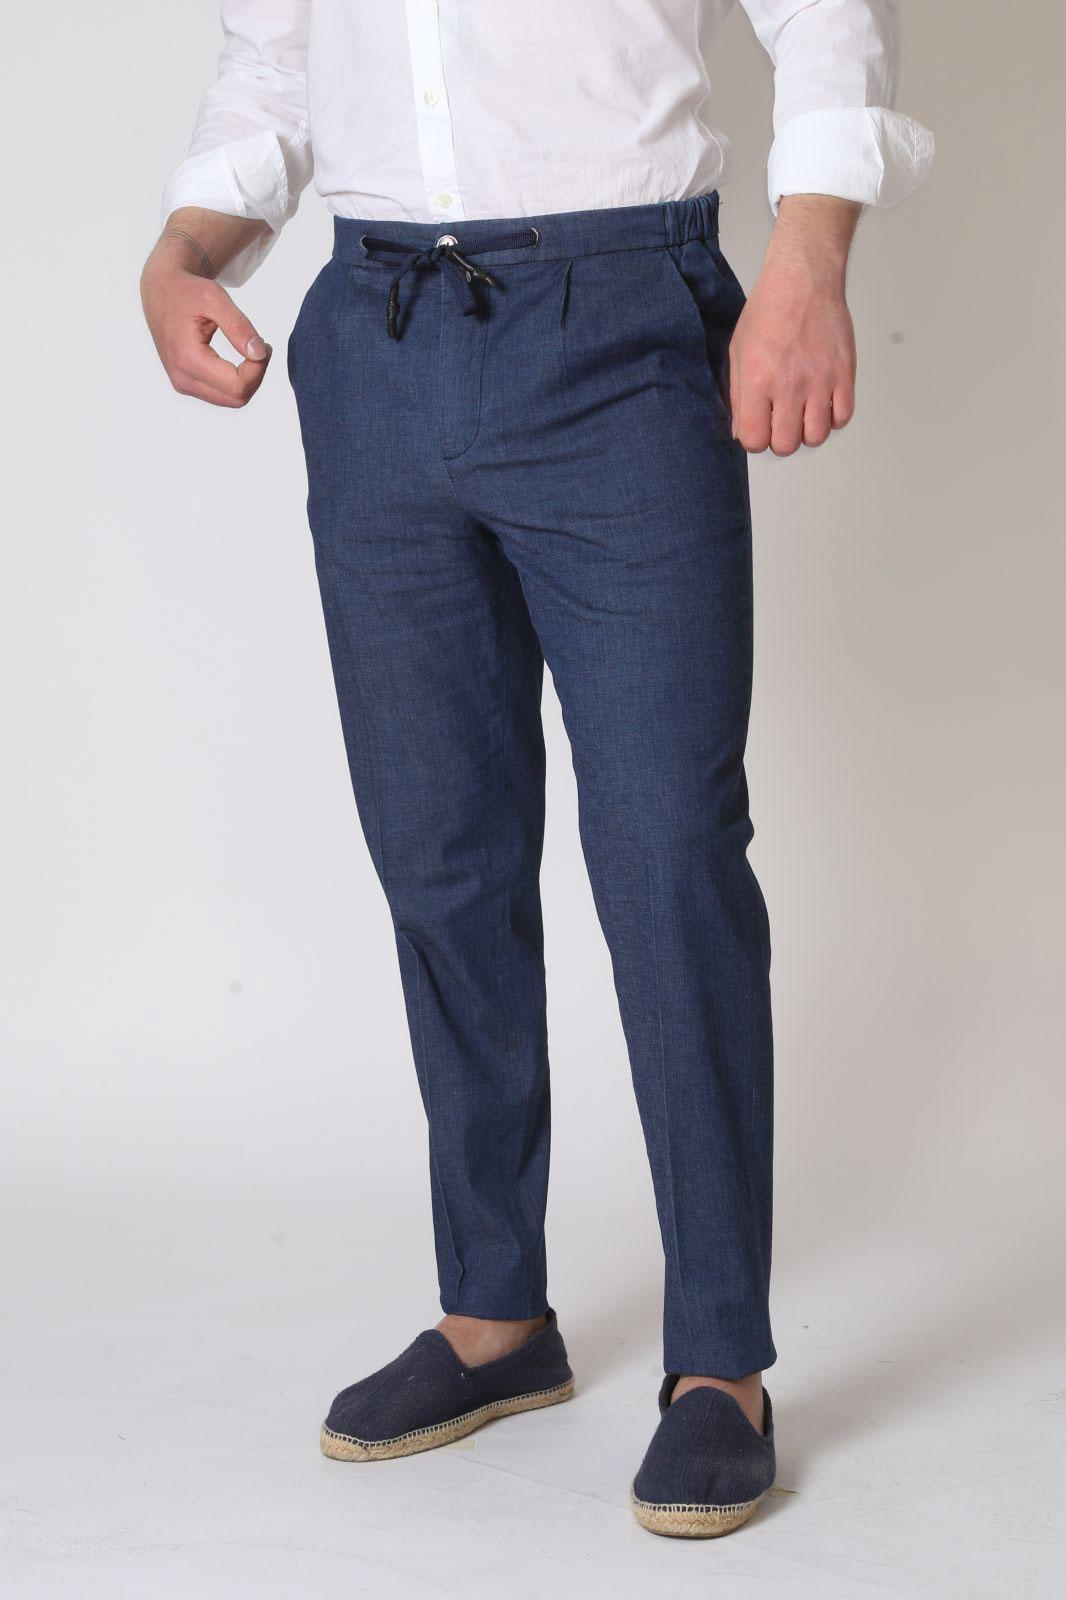 Pantalone Baronio jeans con Coulisse